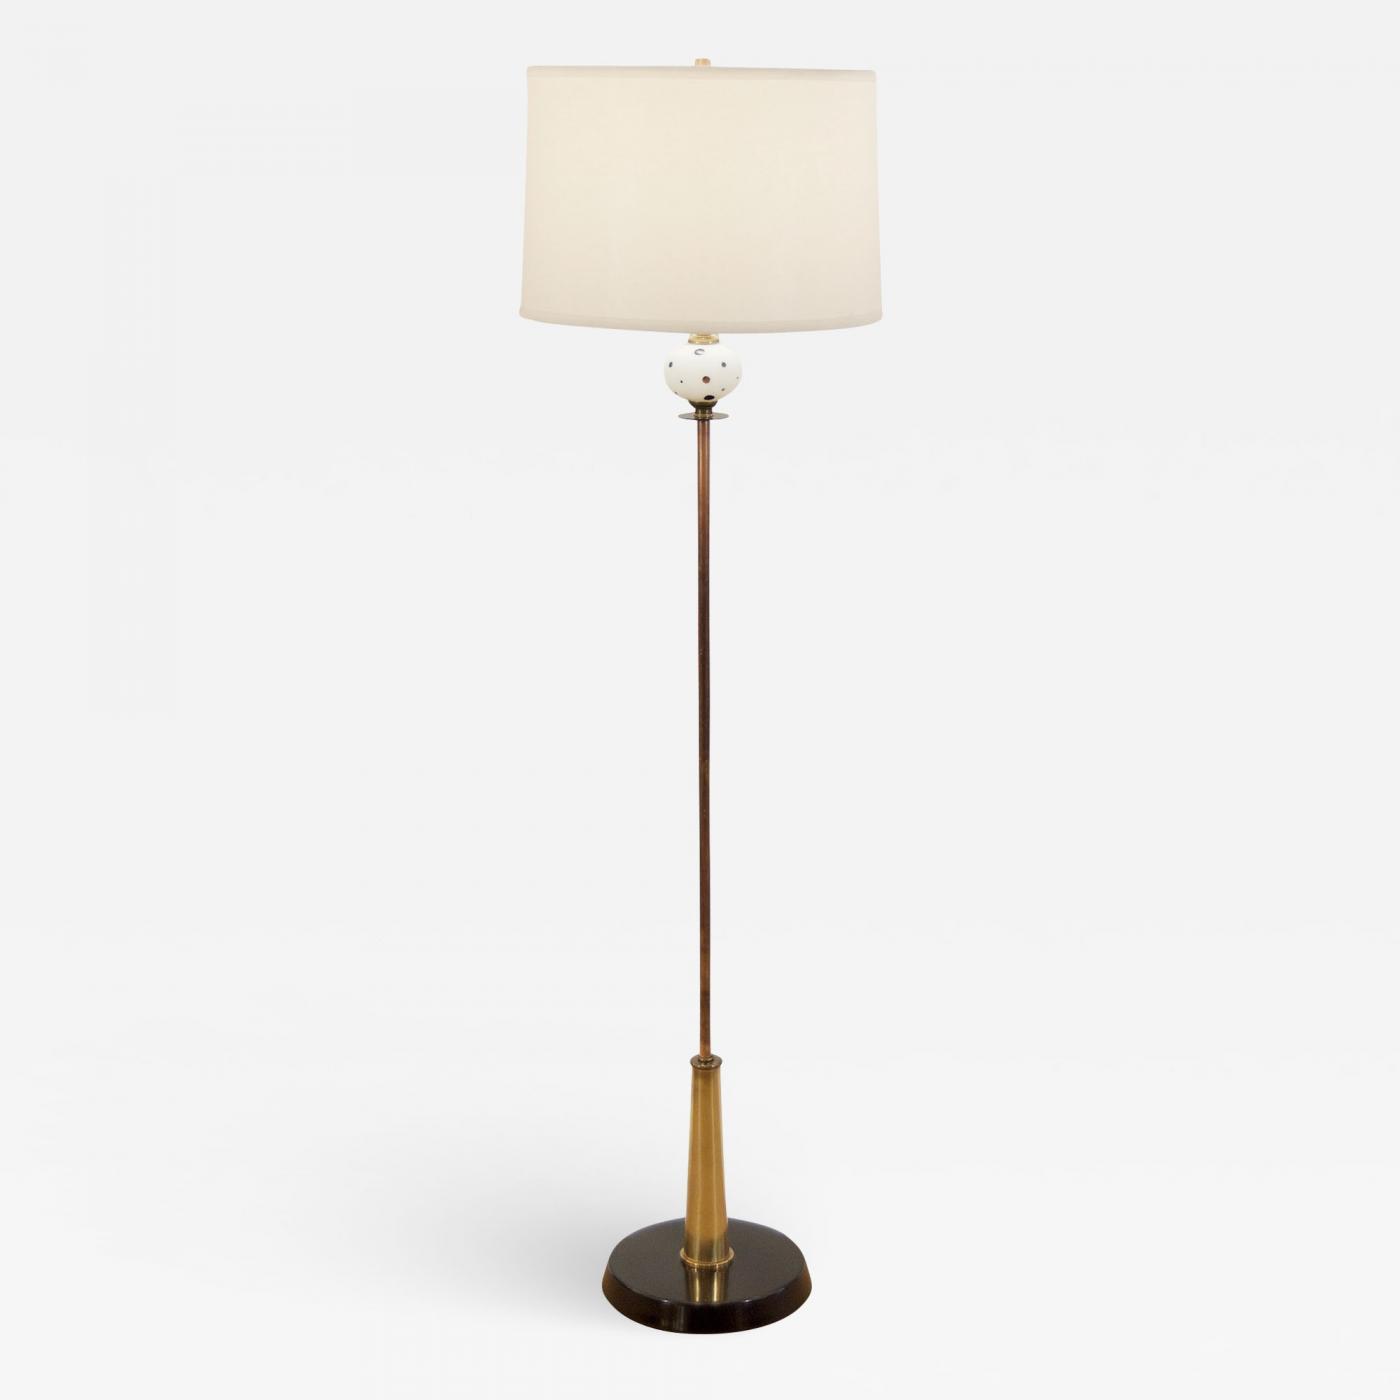 Brass Copper And Enamel Midcentury Floor Lamp